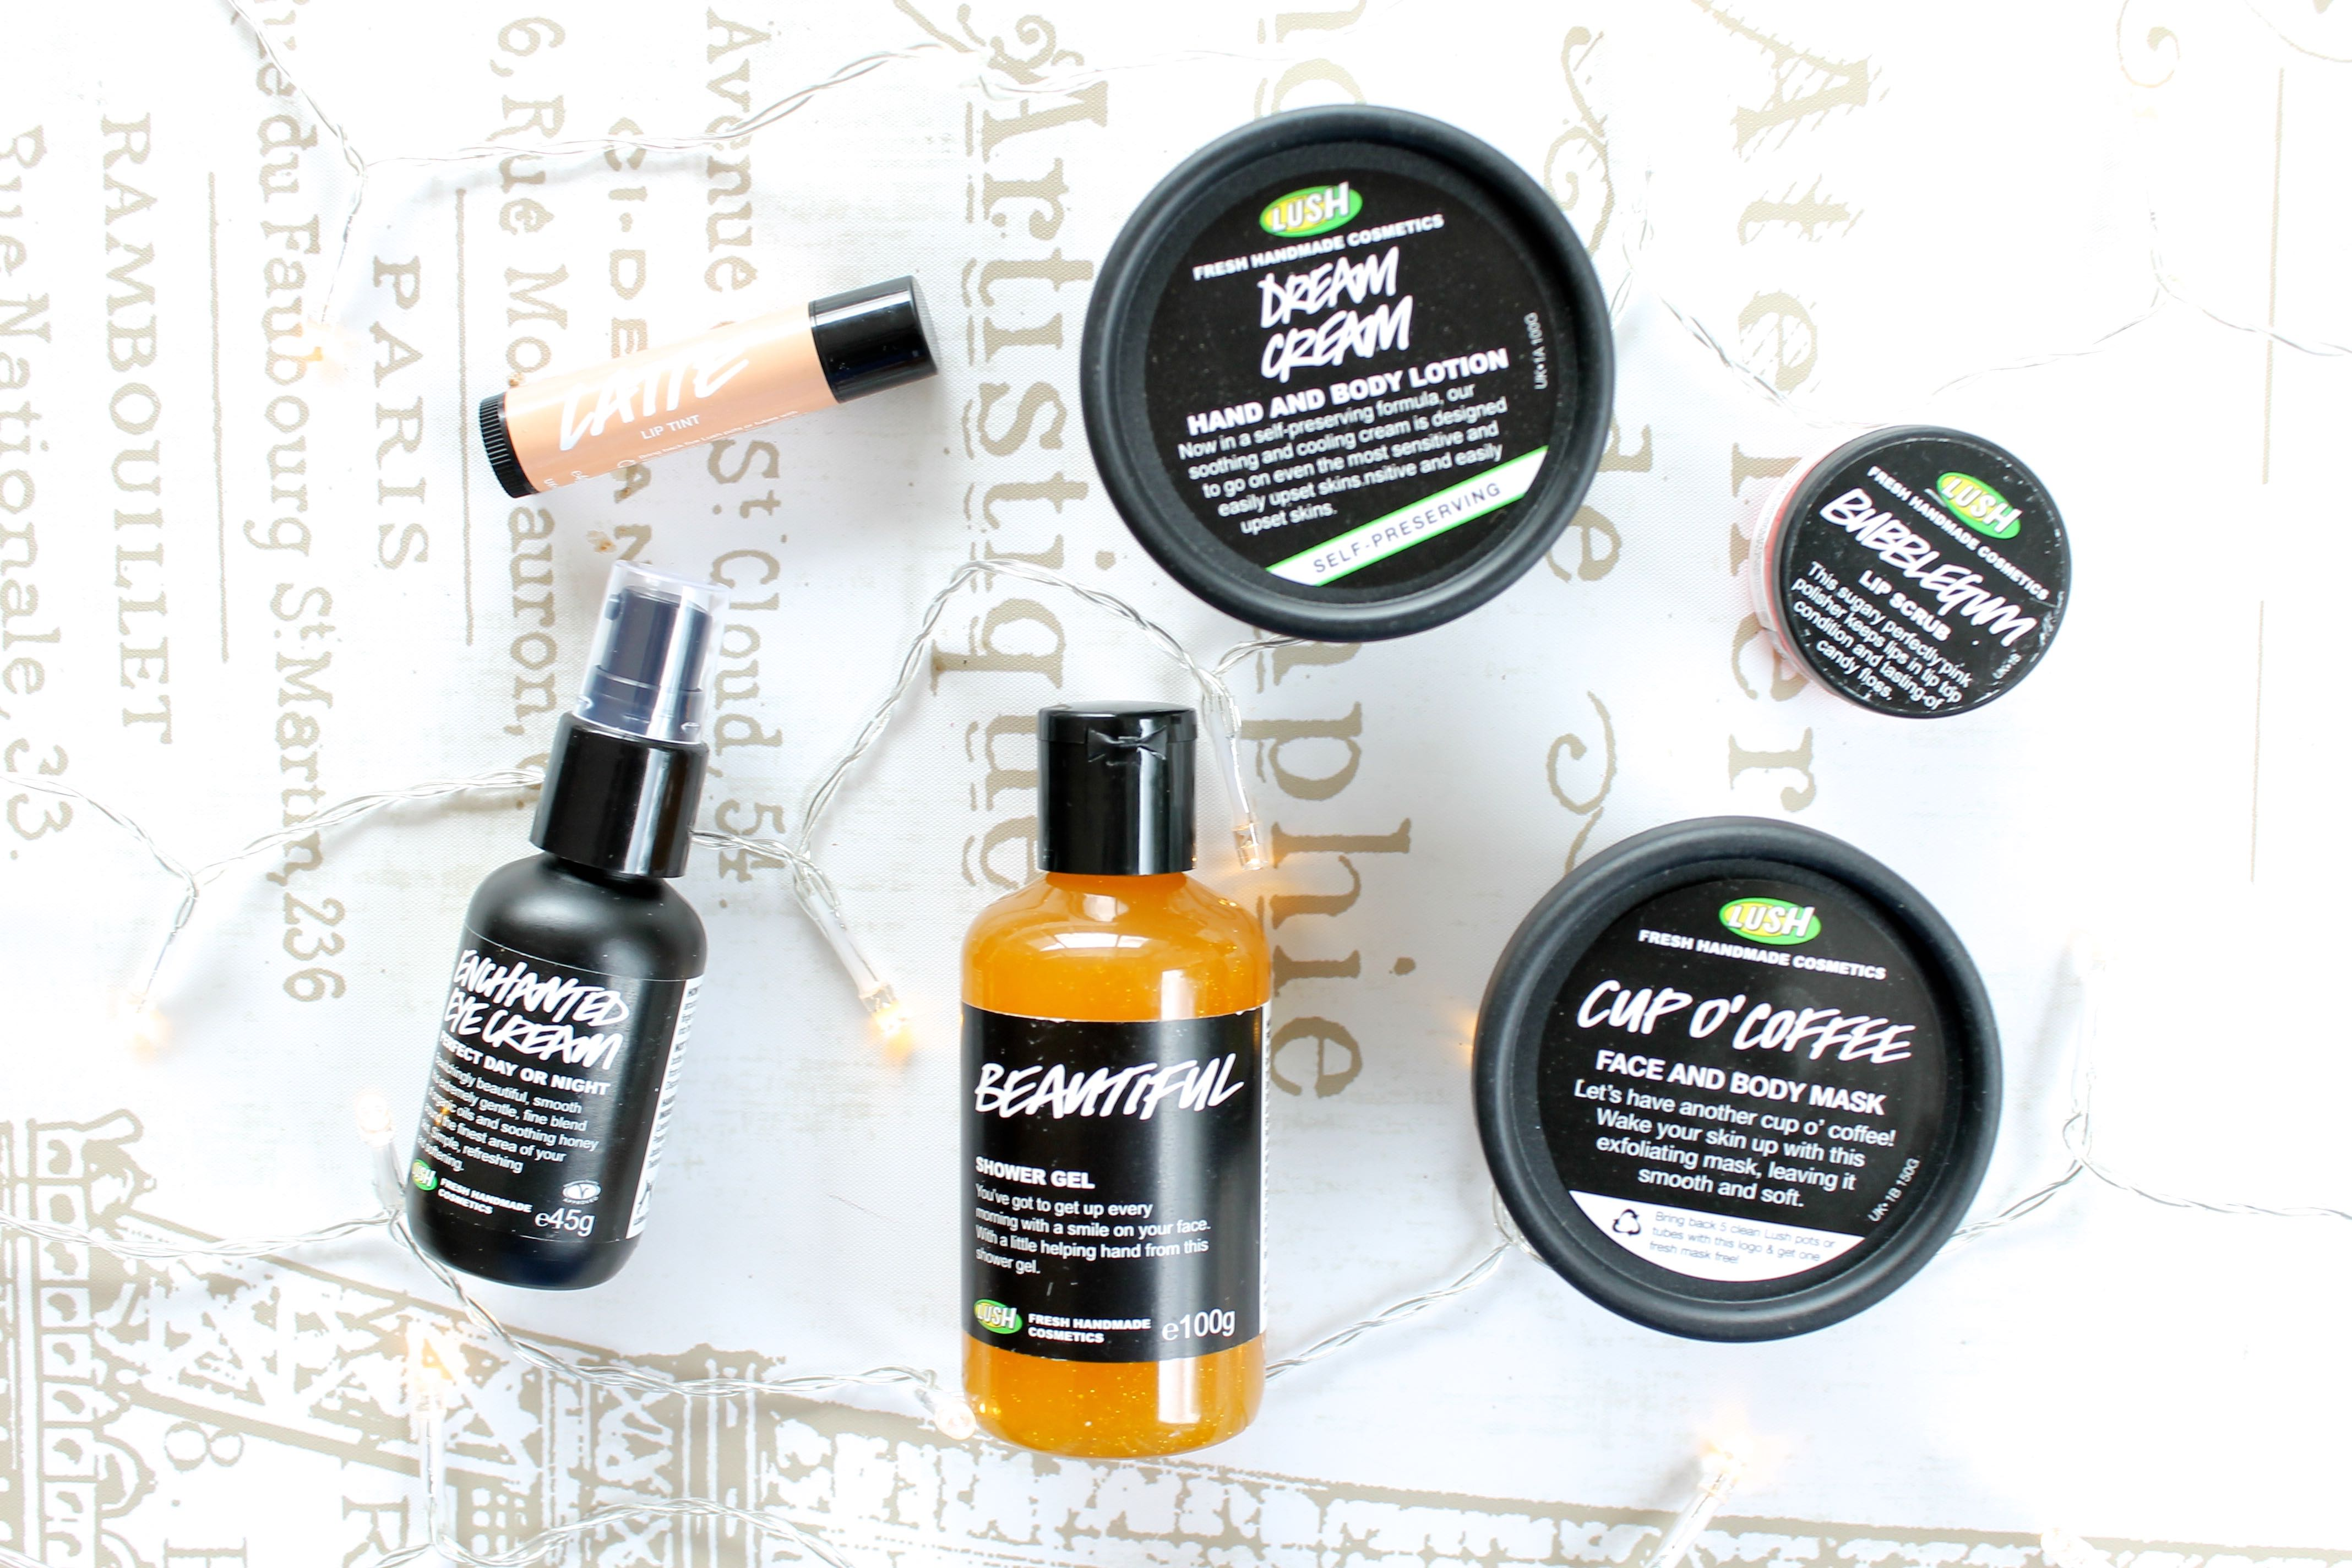 Lush skincare haul blog